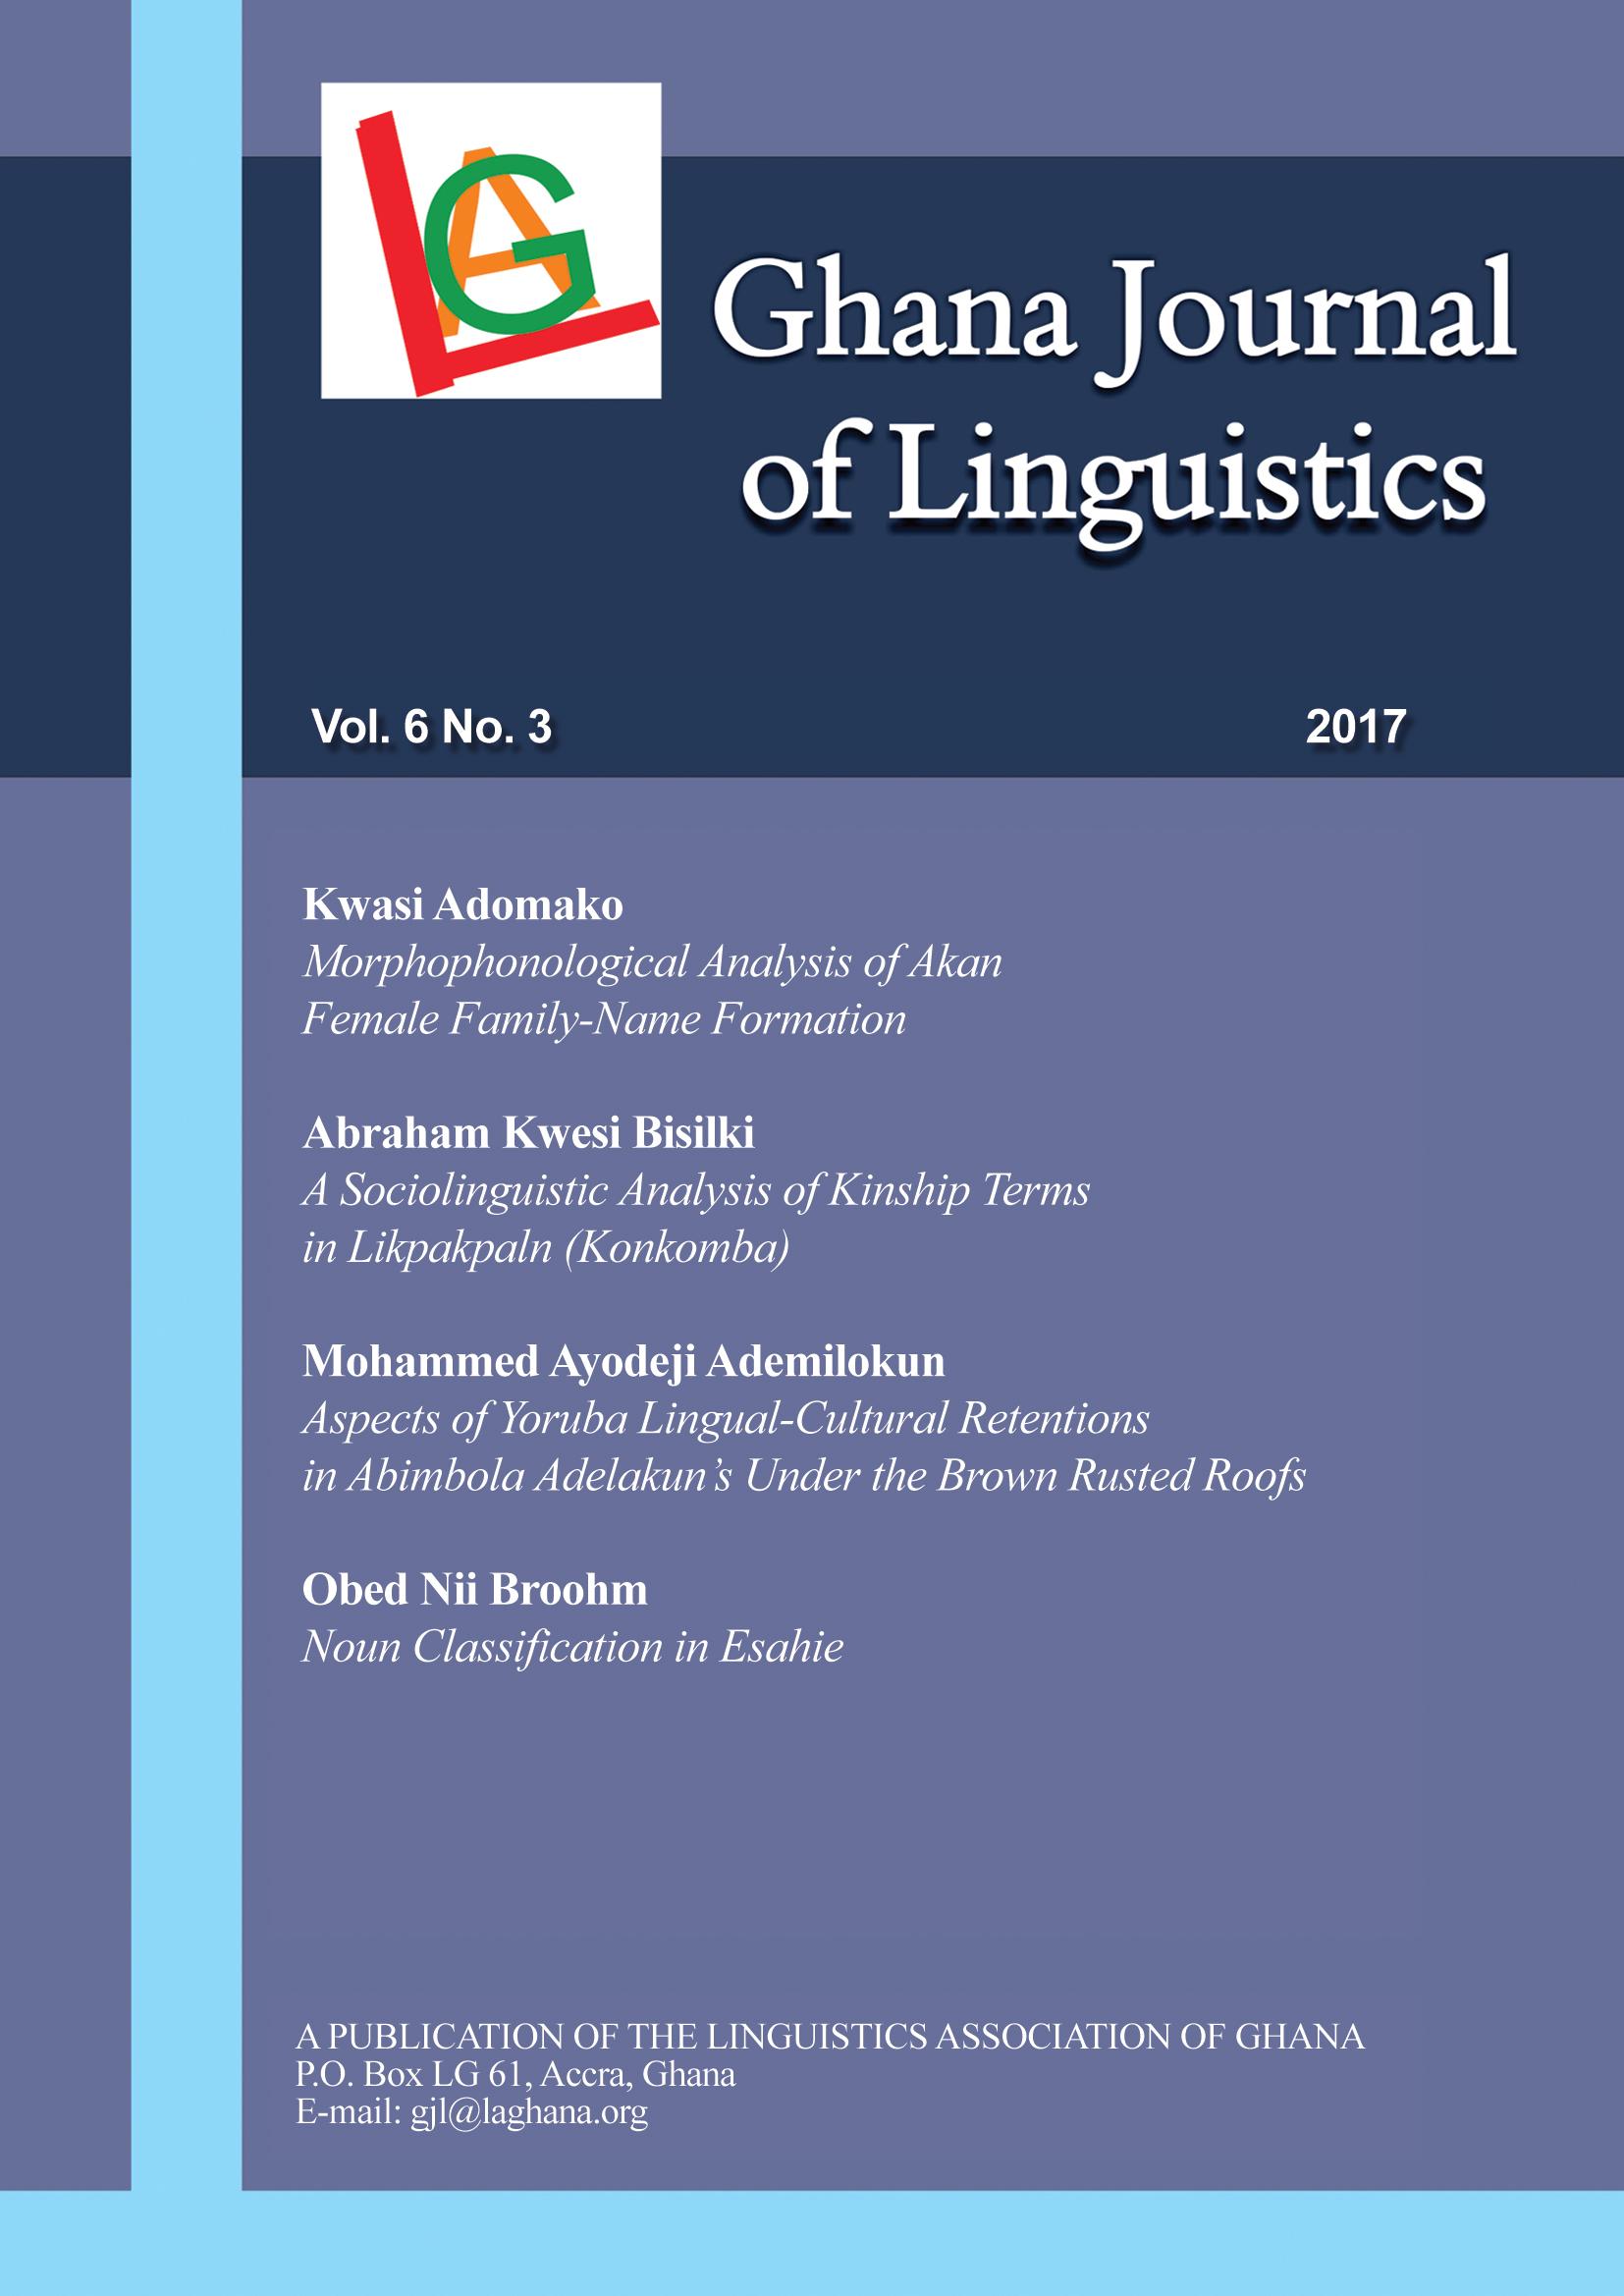 Ghana Journal of Linguistics 6.3 (2017)